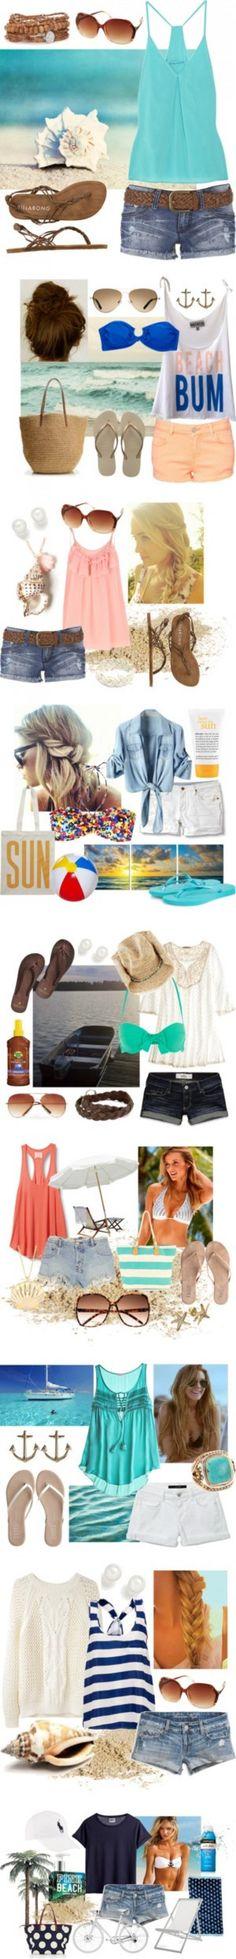 Honeymoon clothes beach clothes, summer styles, cant wait, beach outfits, summer outfits, closet, beach styles, summer clothes, summer wardrobe